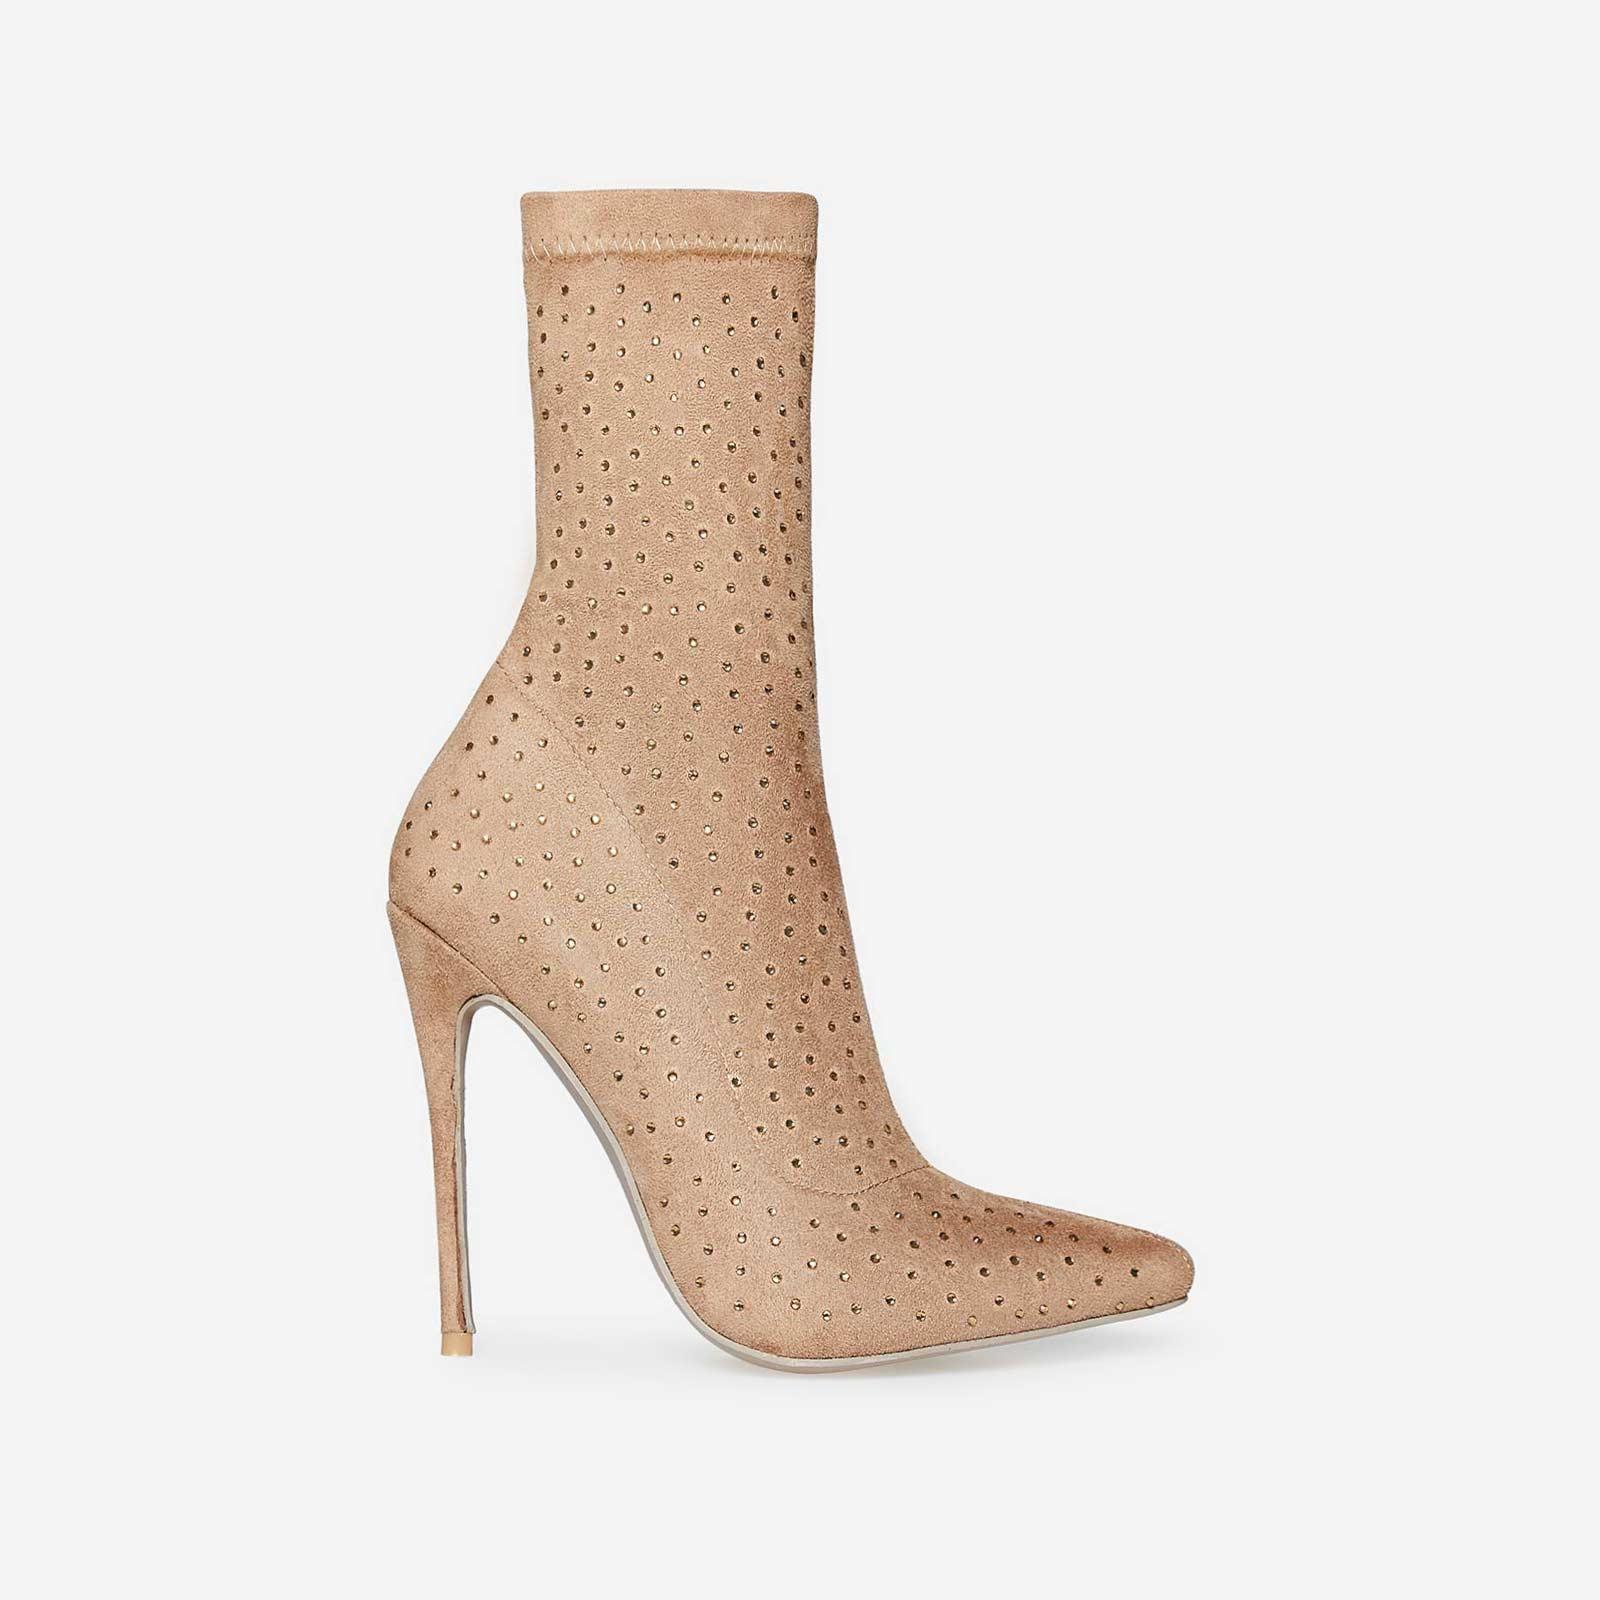 Deta Rose Gold Diamante Sock Boot In Nude Faux Suede